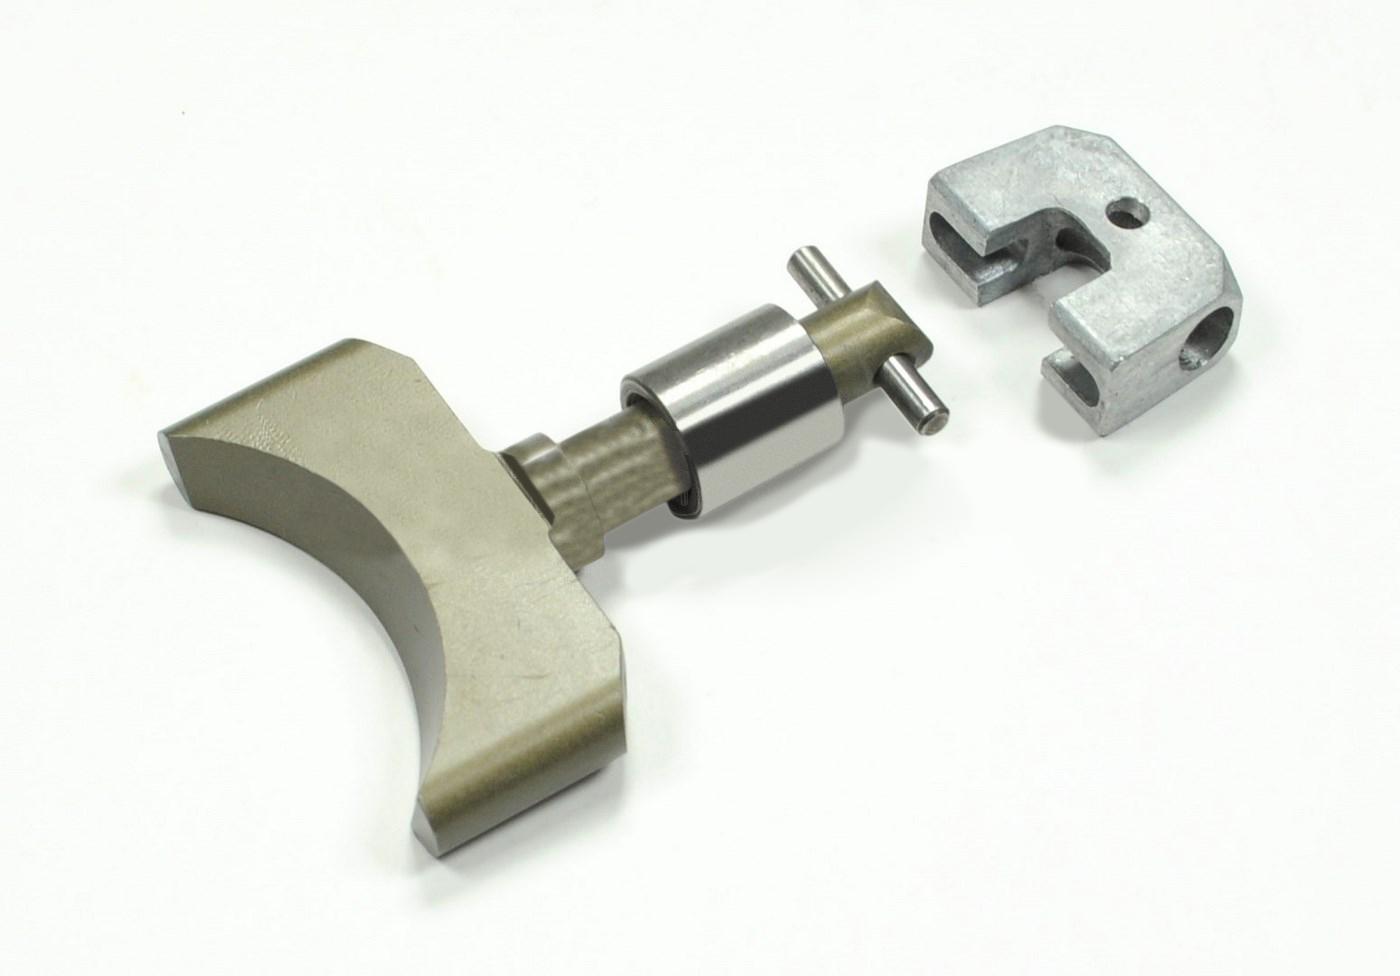 yamaha power valve xl xlt gp gpr 800 1200 800r 1200r new